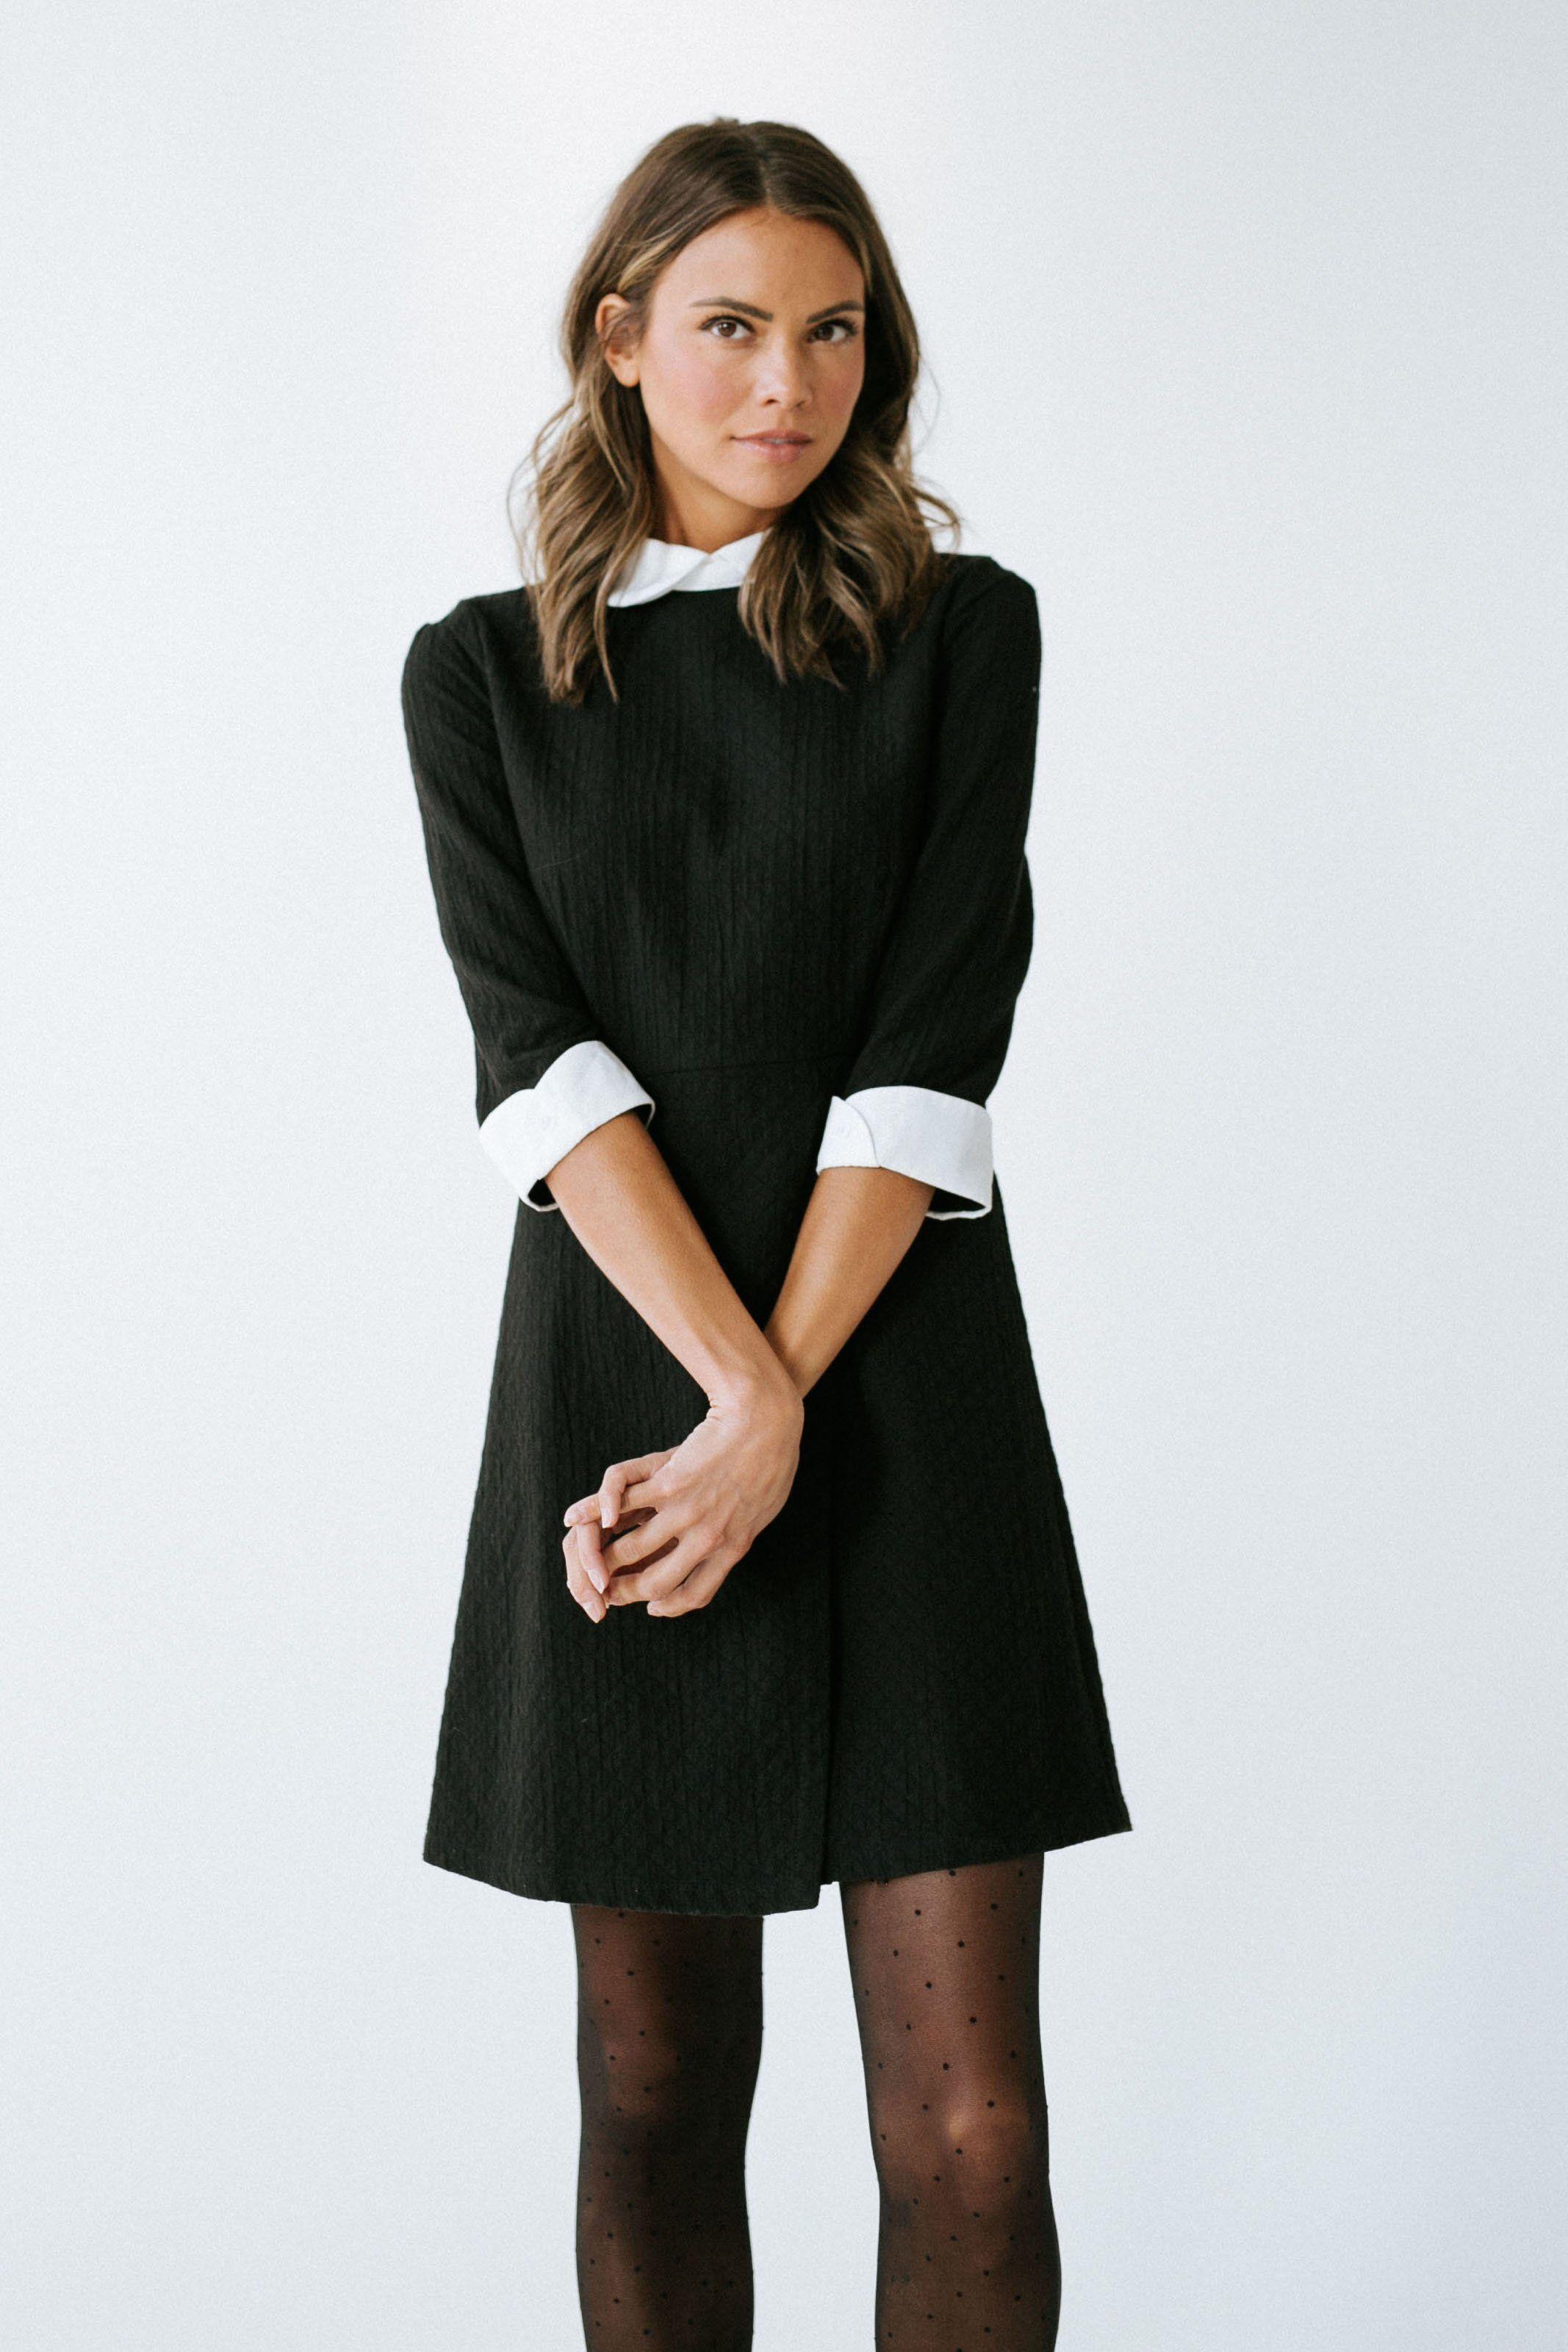 Madeline Dress Cladandcloth White Boho Dress Clad And Cloth Fashion Outfits [ 3201 x 2134 Pixel ]